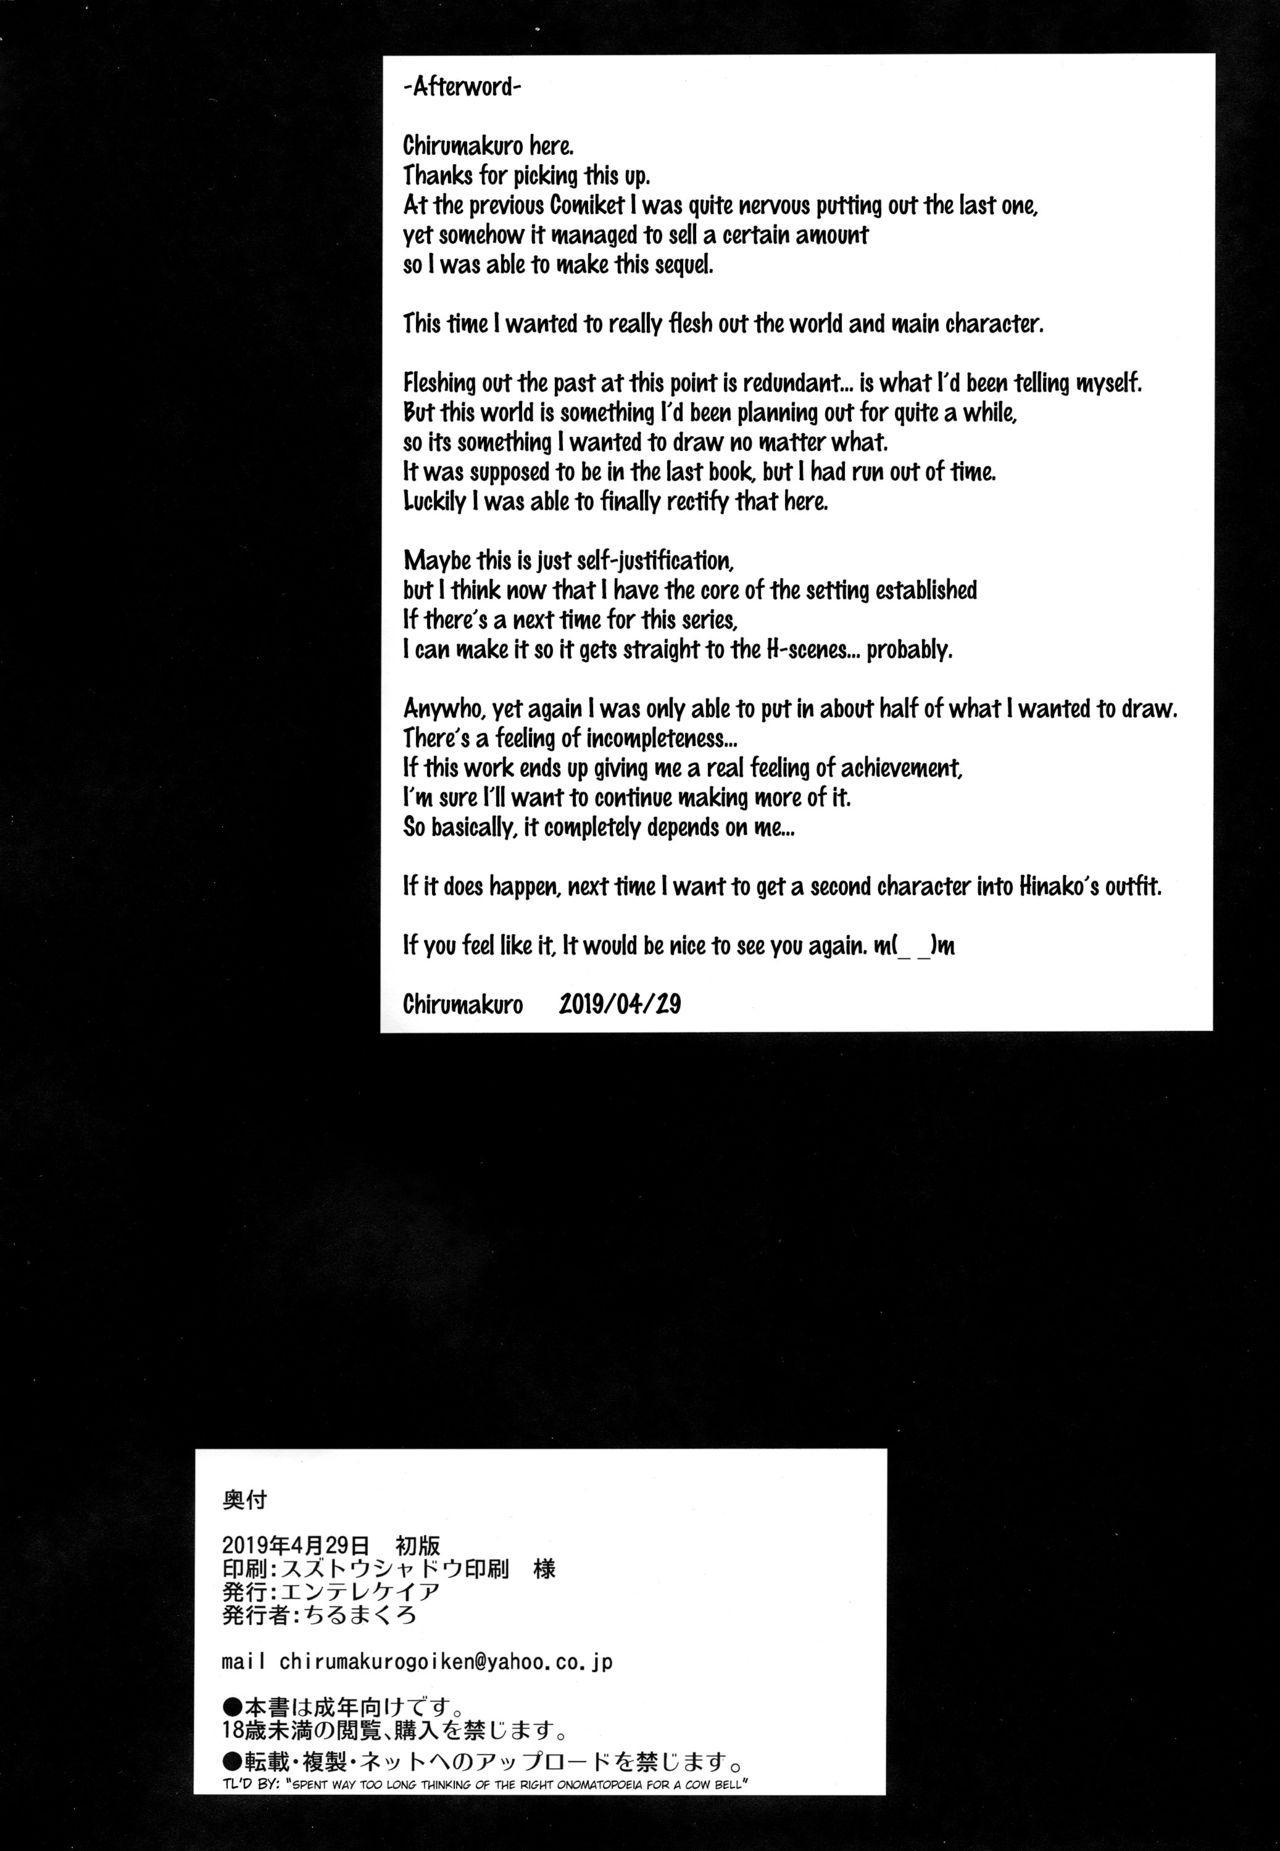 (COMIC1☆15) [Entelekheia (Chirumakuro)] Hinako Ikusei Nisshi 2 ~Hinako no Kako to Genzai~ | Hinako Rearing Log 2 - Hinako's Past and Present [English] 31